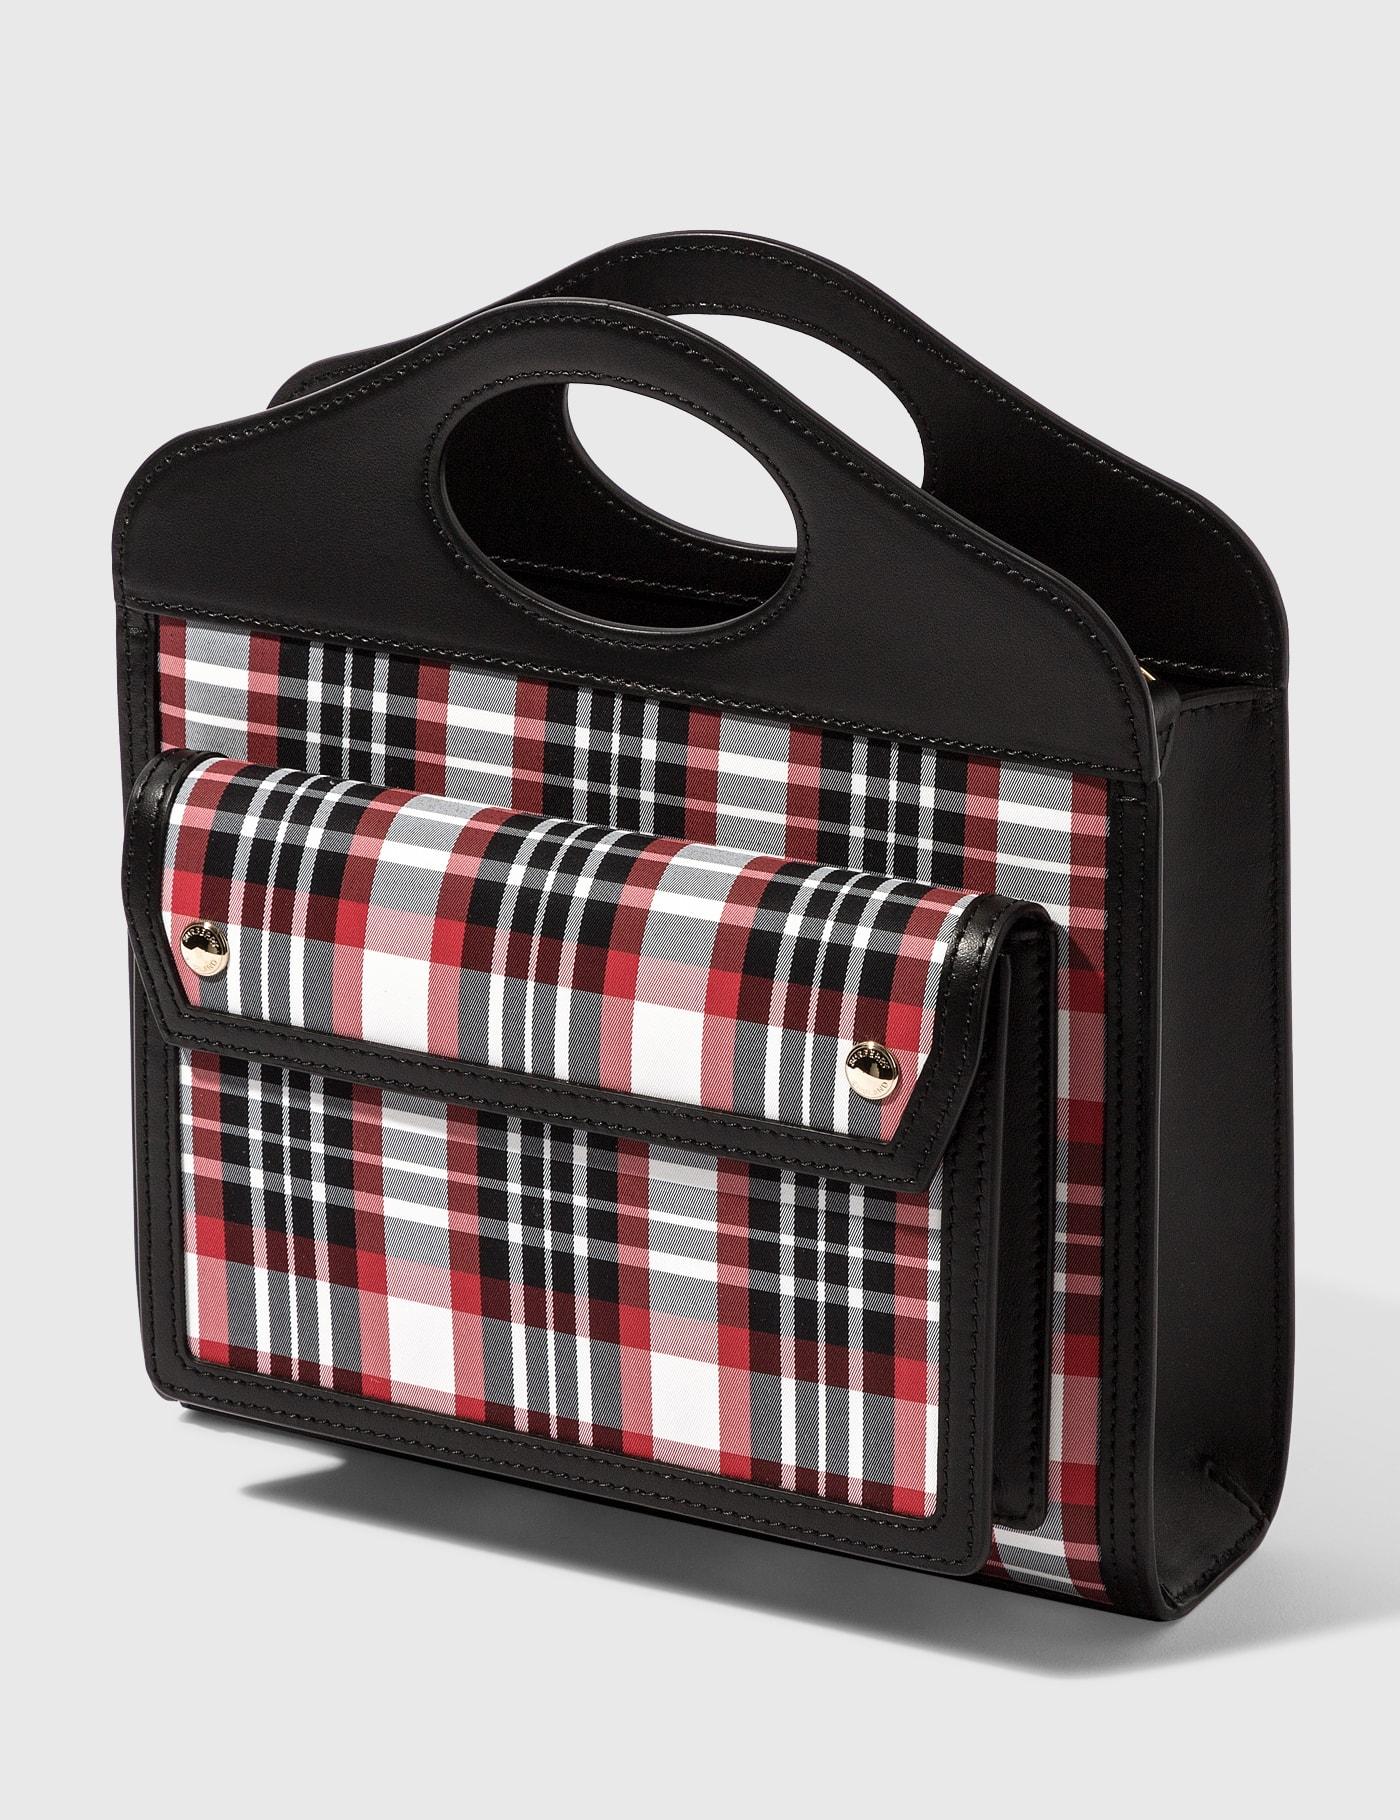 Burberry MINI TARTAN NYLON AND LEATHER POCKET BAG